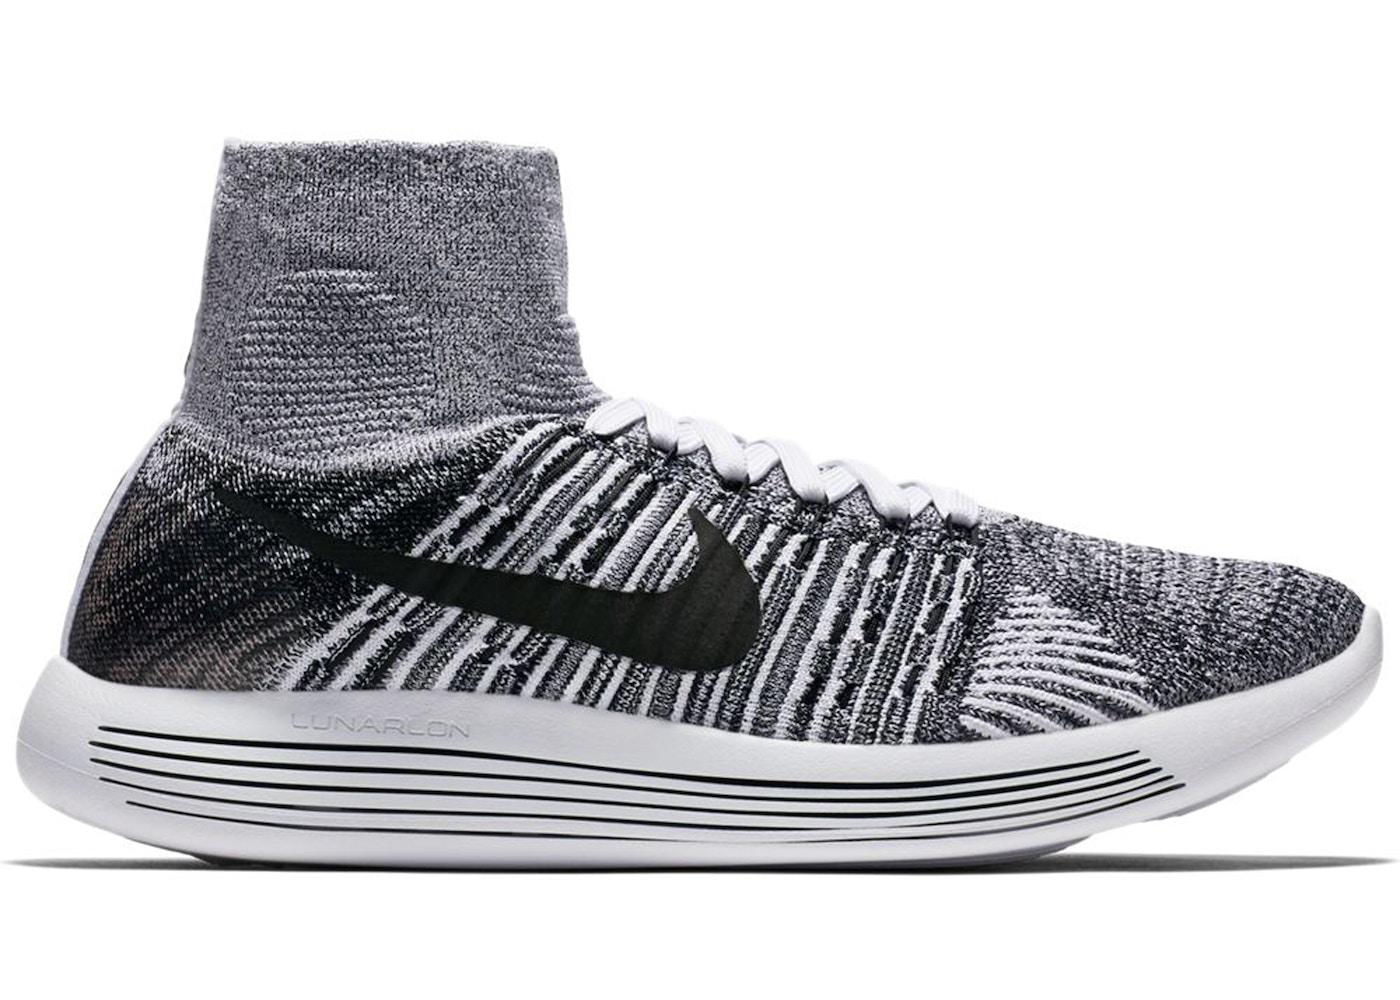 sale retailer 602d1 b953e Nike Lunarepic Flyknit Oreo - 818676-101